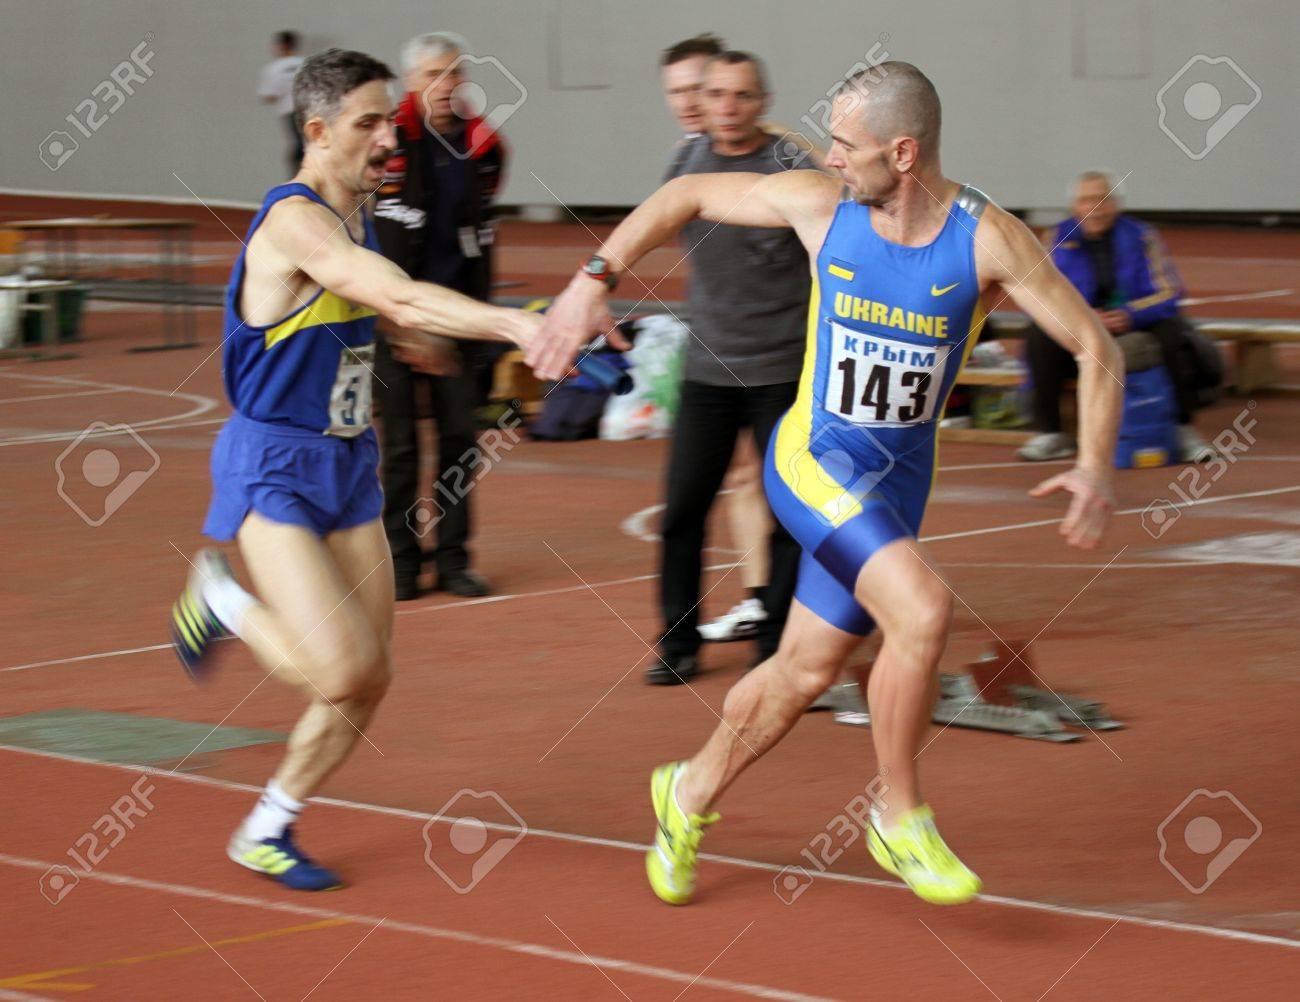 Unidentified men at the relay race on Ukrainian Veteran Track   Field Championships on March 03, 2012 in Kiev, Ukraine  Stock Photo - 12662751